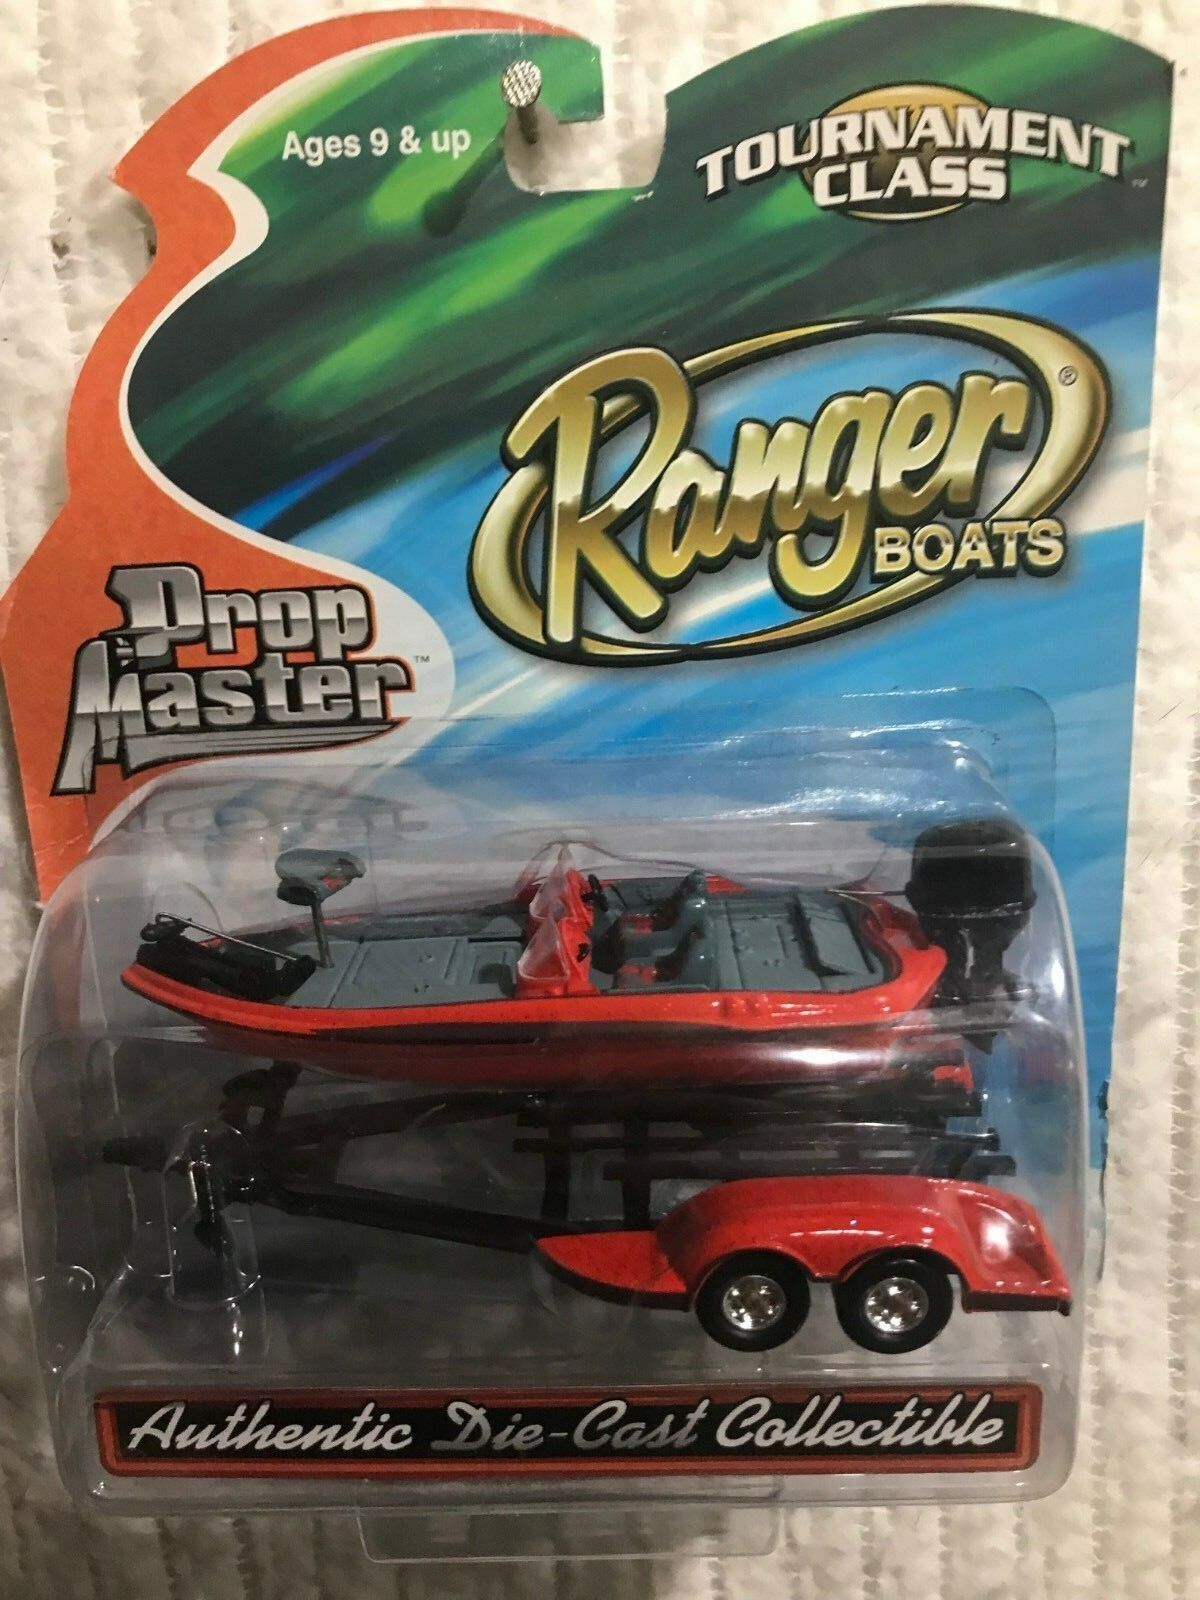 Clase de torneo Utilería Master Ranger Boats